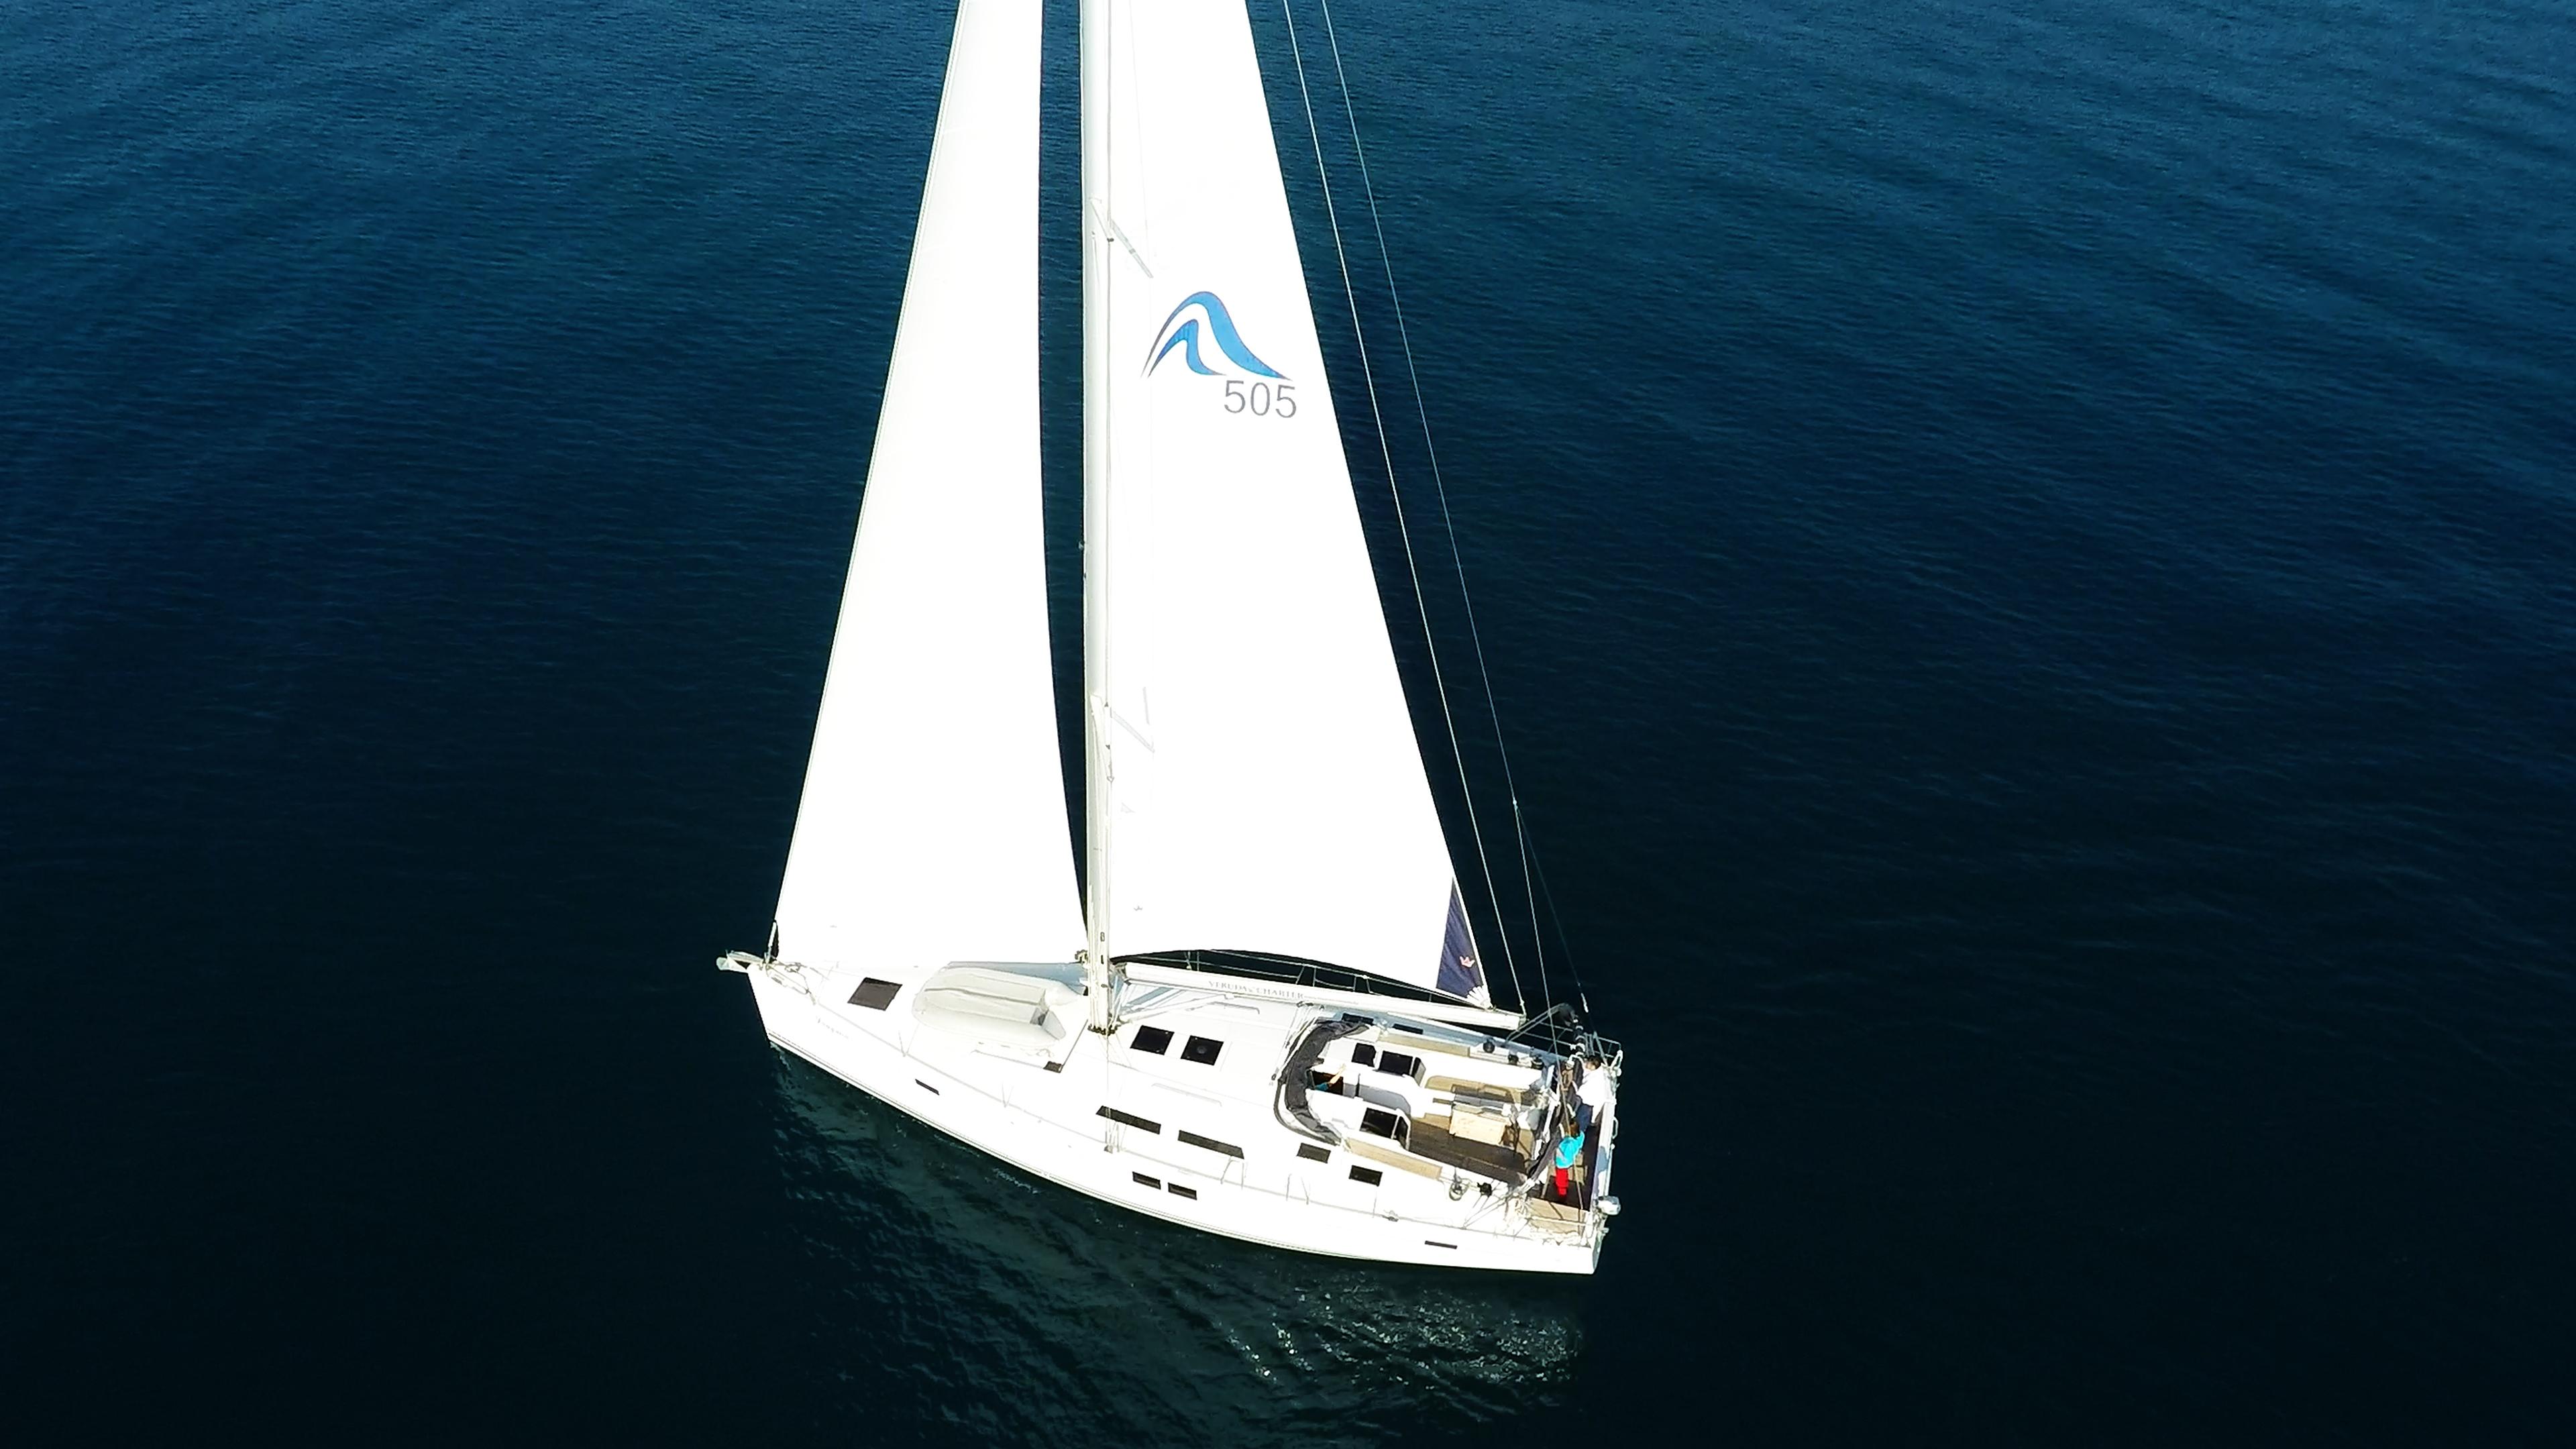 barcha a vela Hanse 505 coperta per yacht a vela vele pozzetto